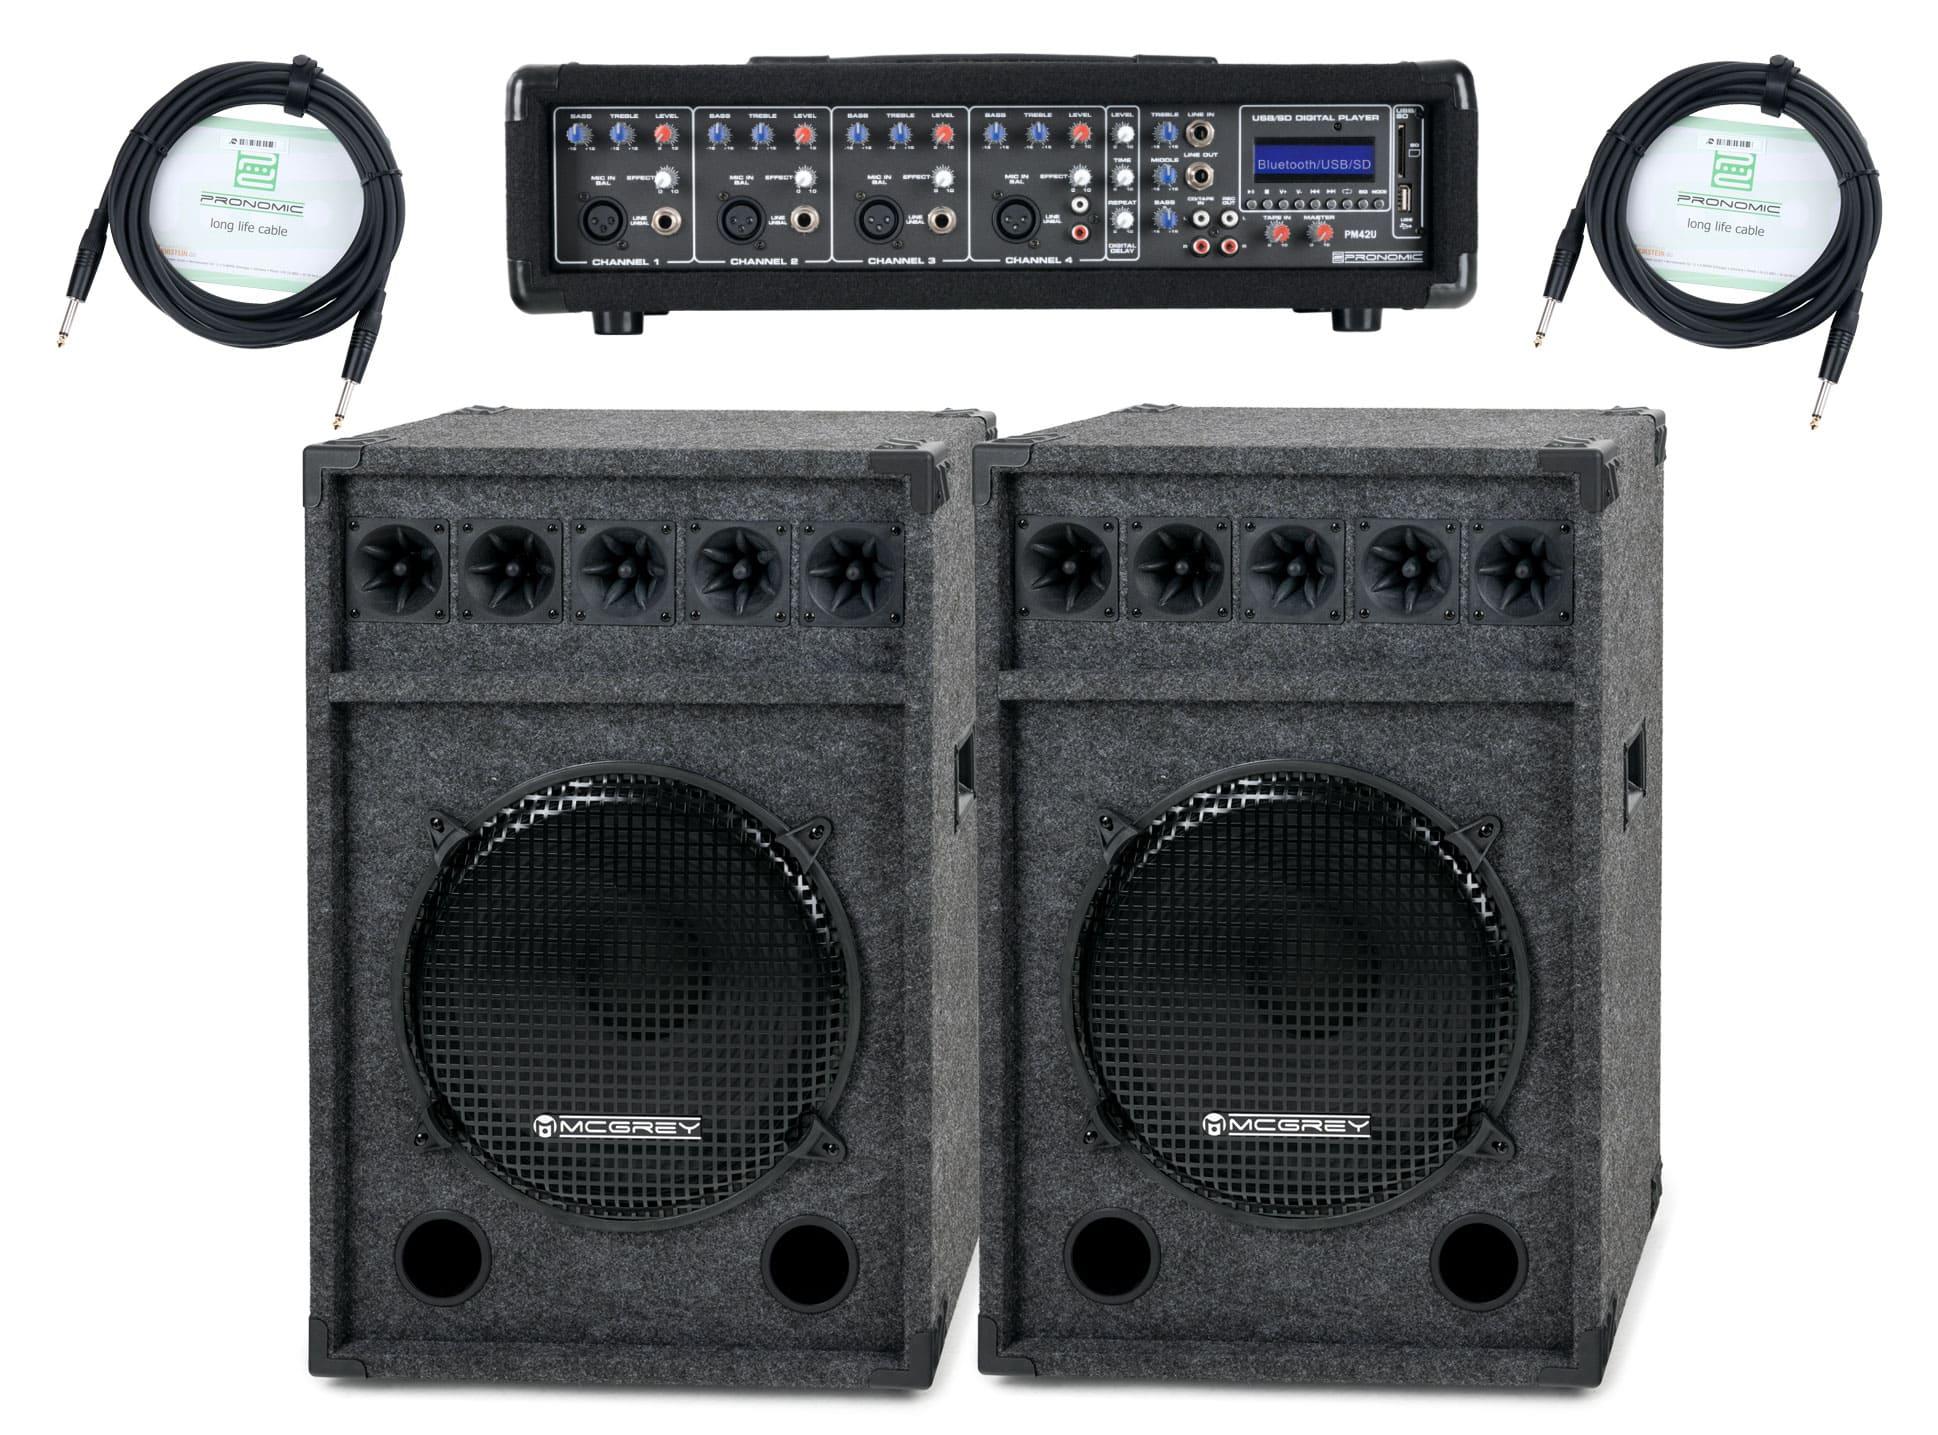 Pronomic PM42 Festival StagePower Set